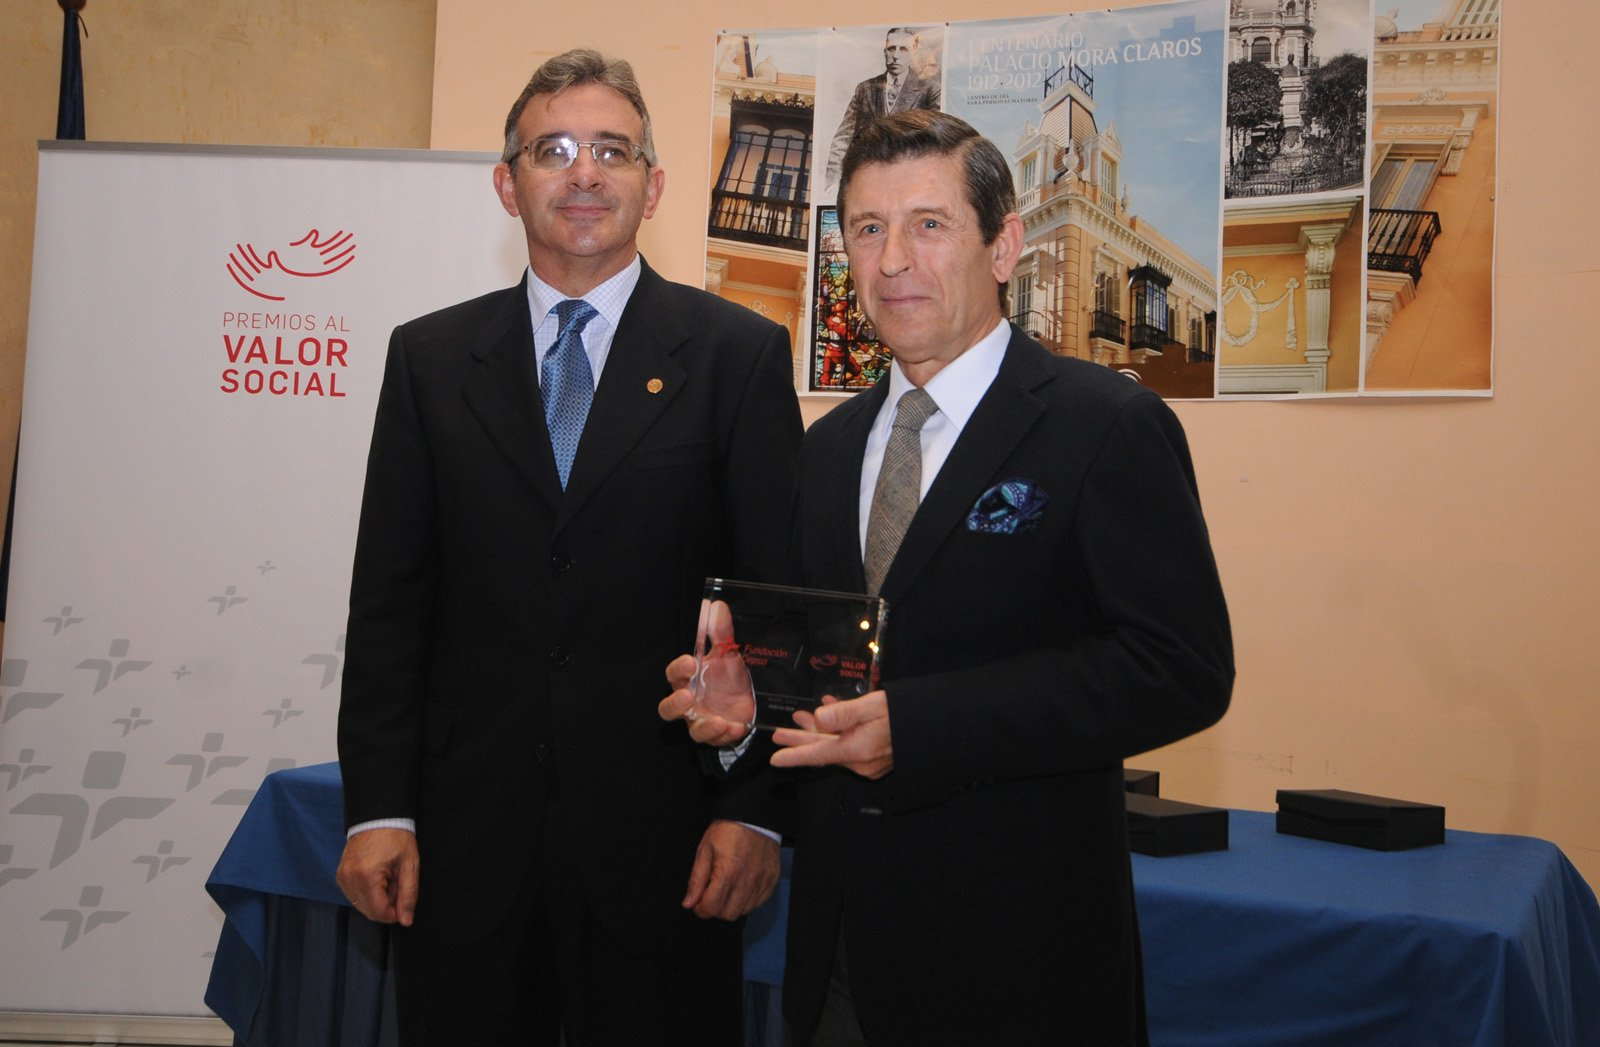 Premios CEPSA008